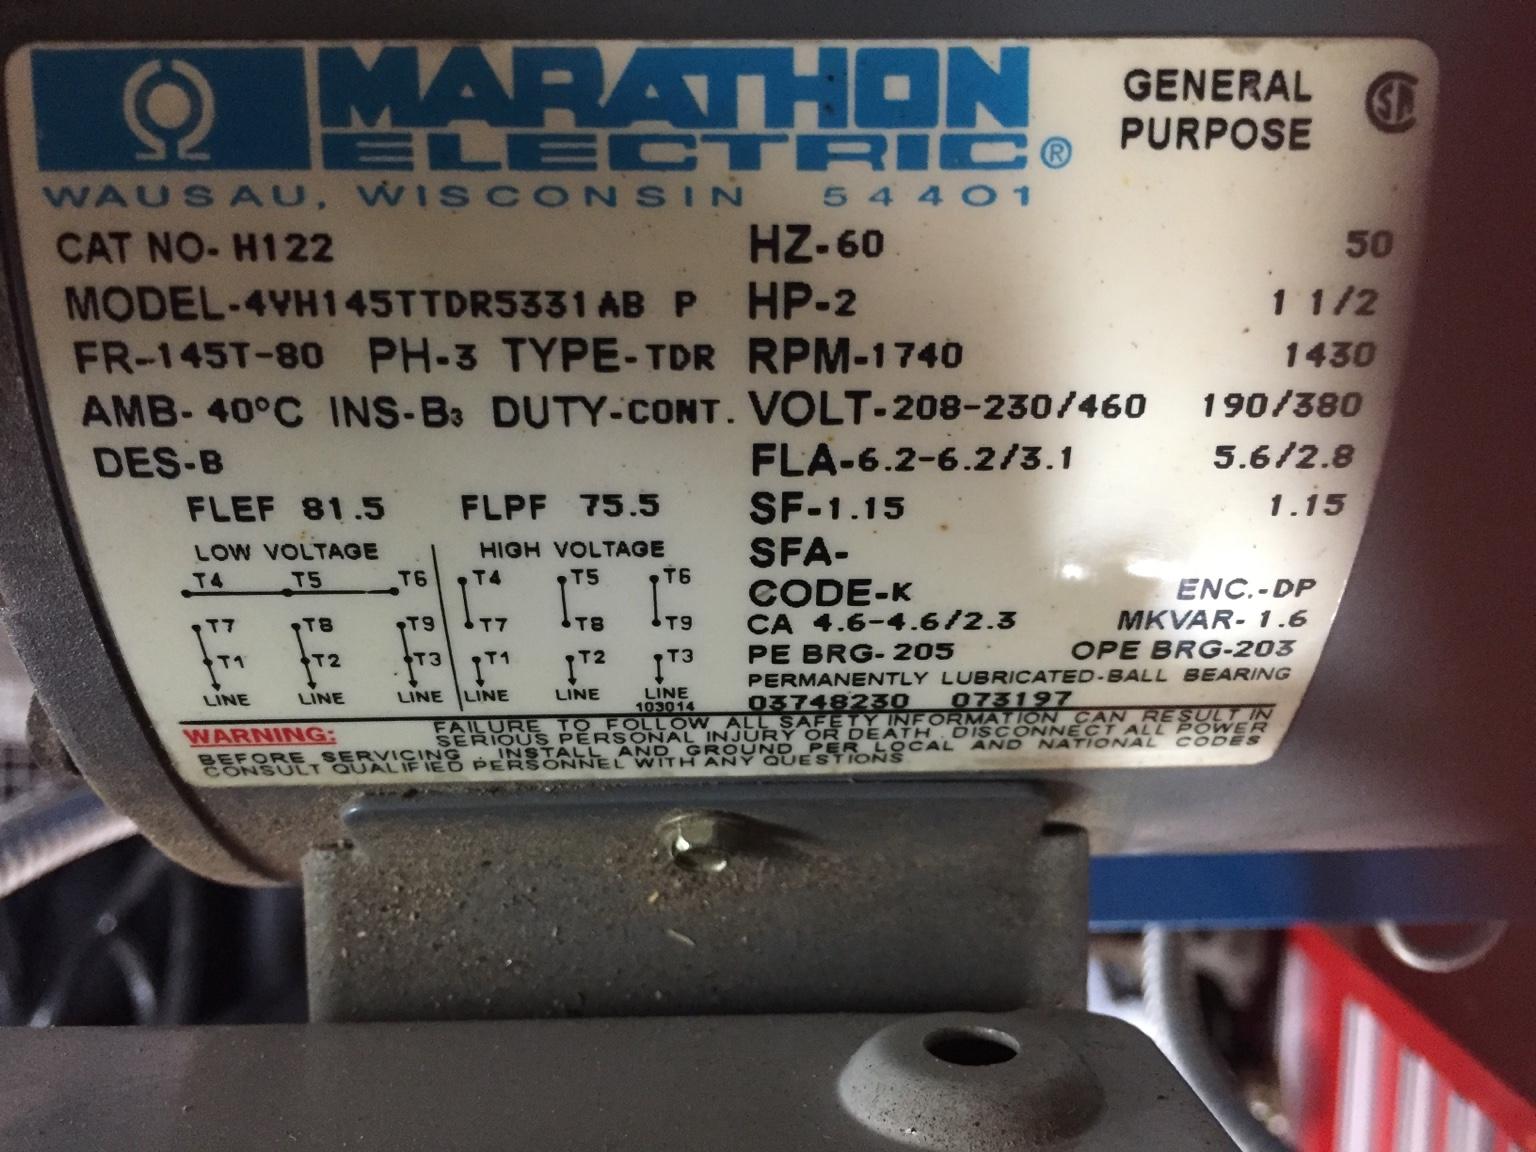 Compressor motor swap help!! [Archive] - The Garage Journal Board